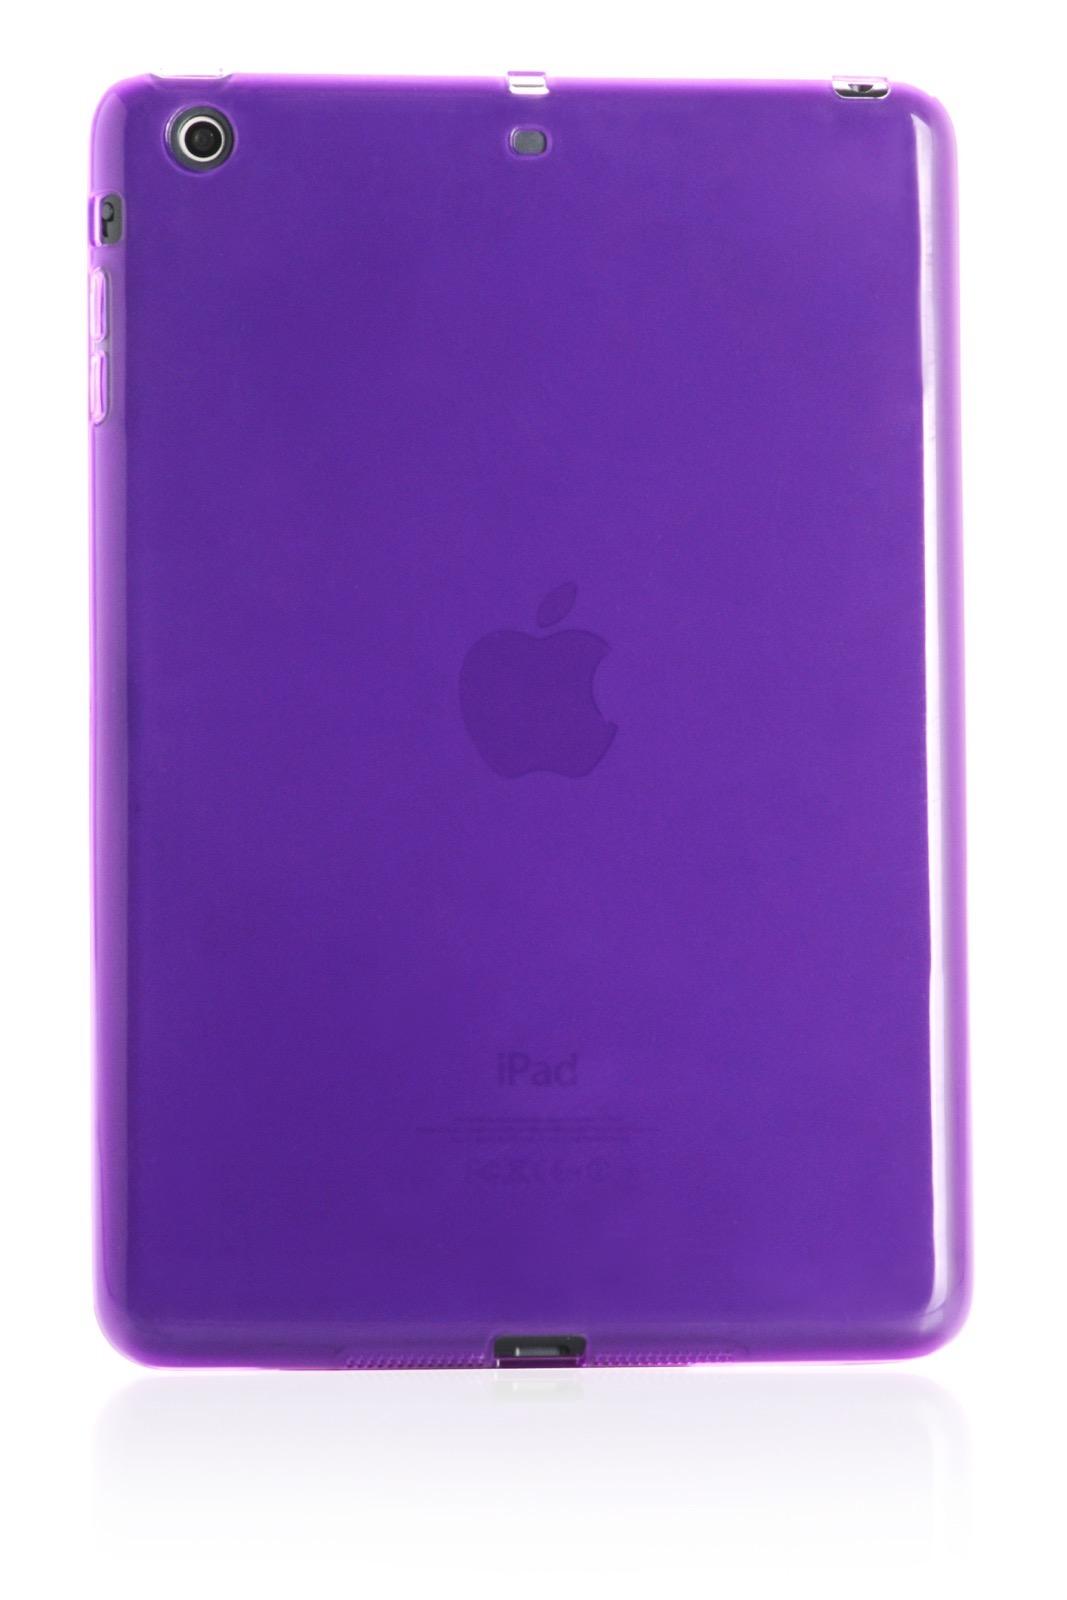 "Чехол для планшета iNeez накладка силикон глянцевый 410232 для Apple iPad mini 7.9"", фиолетовый"